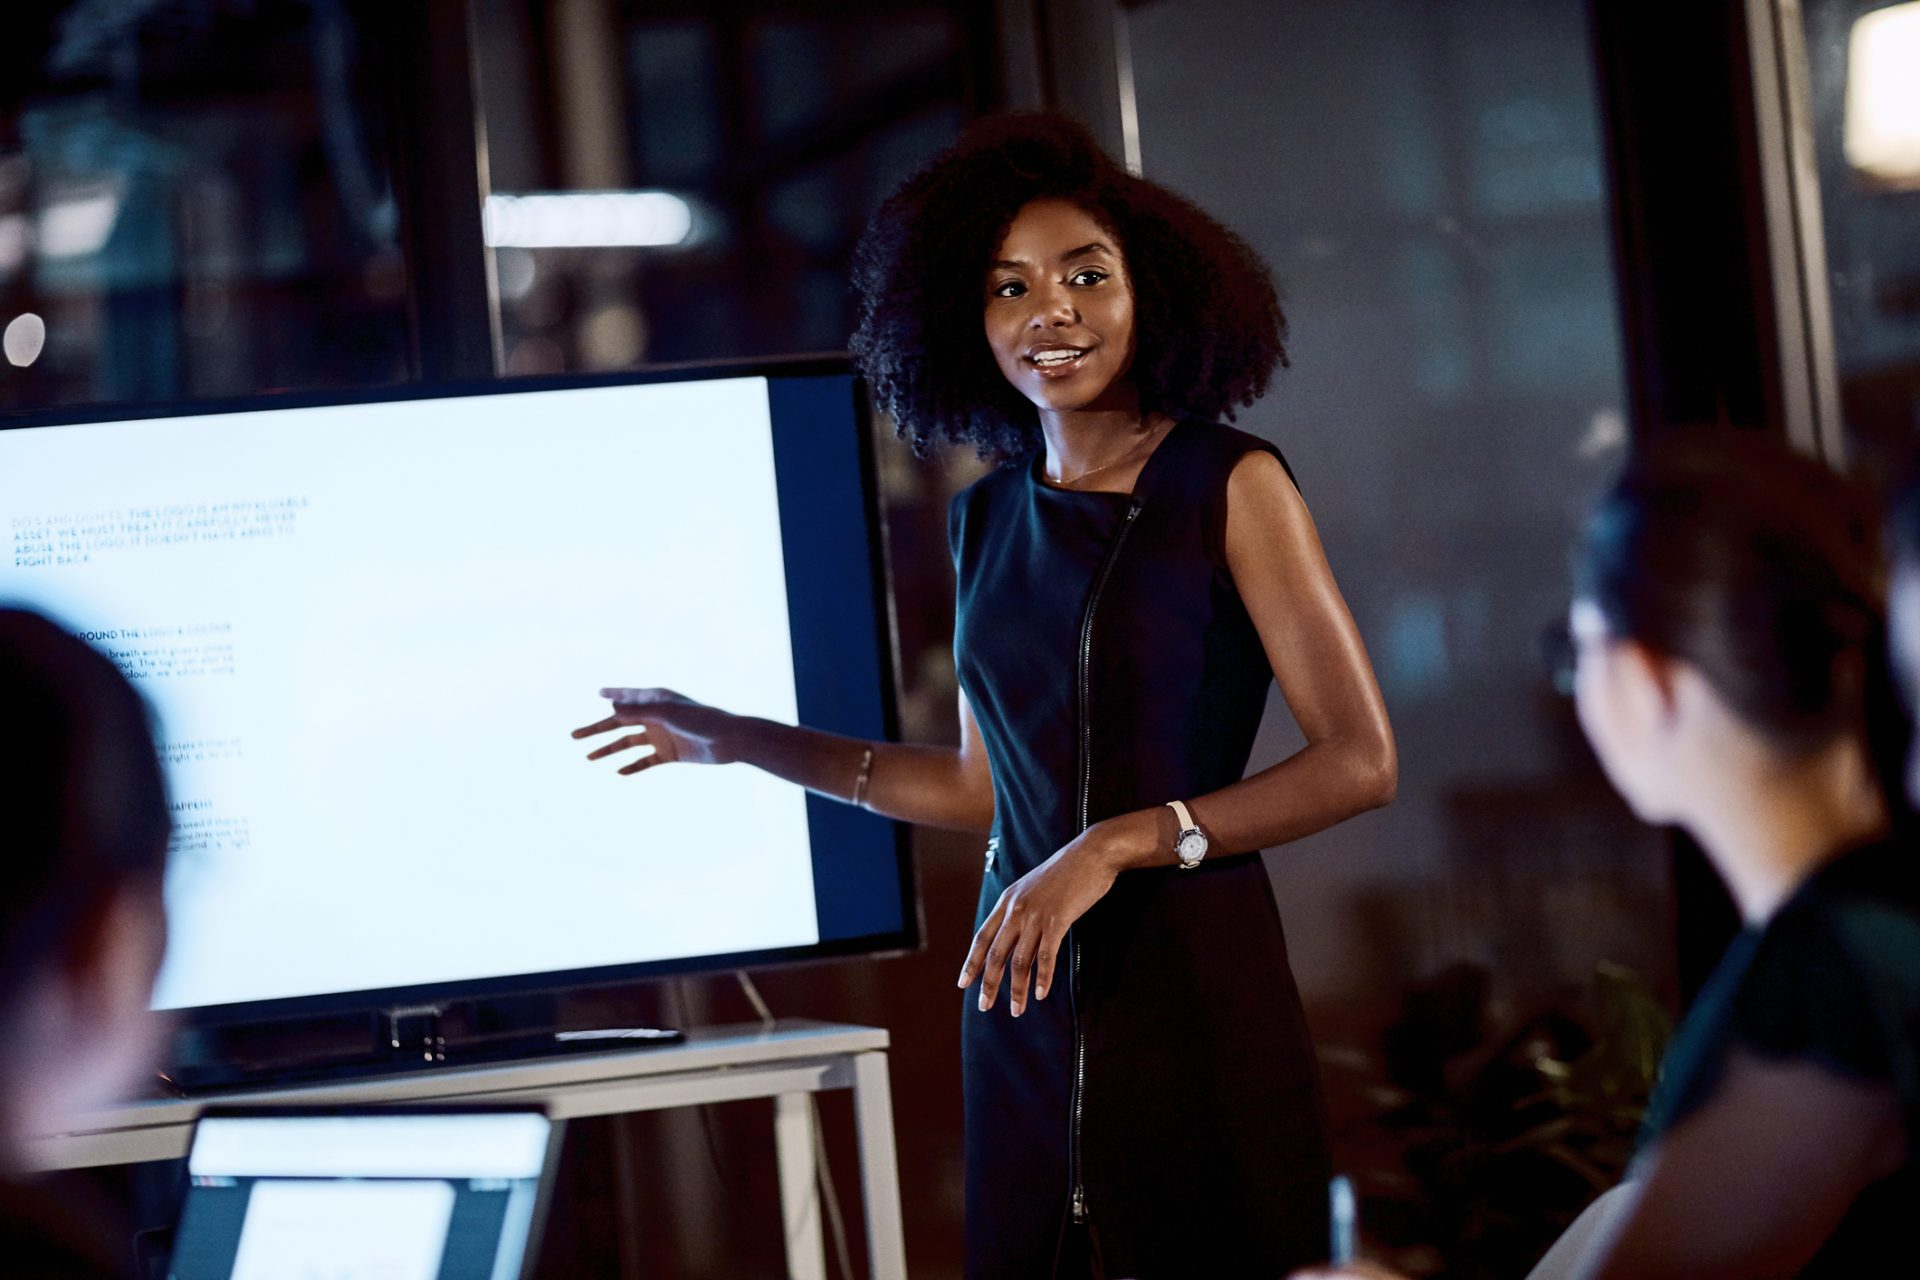 businesswoman gives presentation on market researchers digital transformation